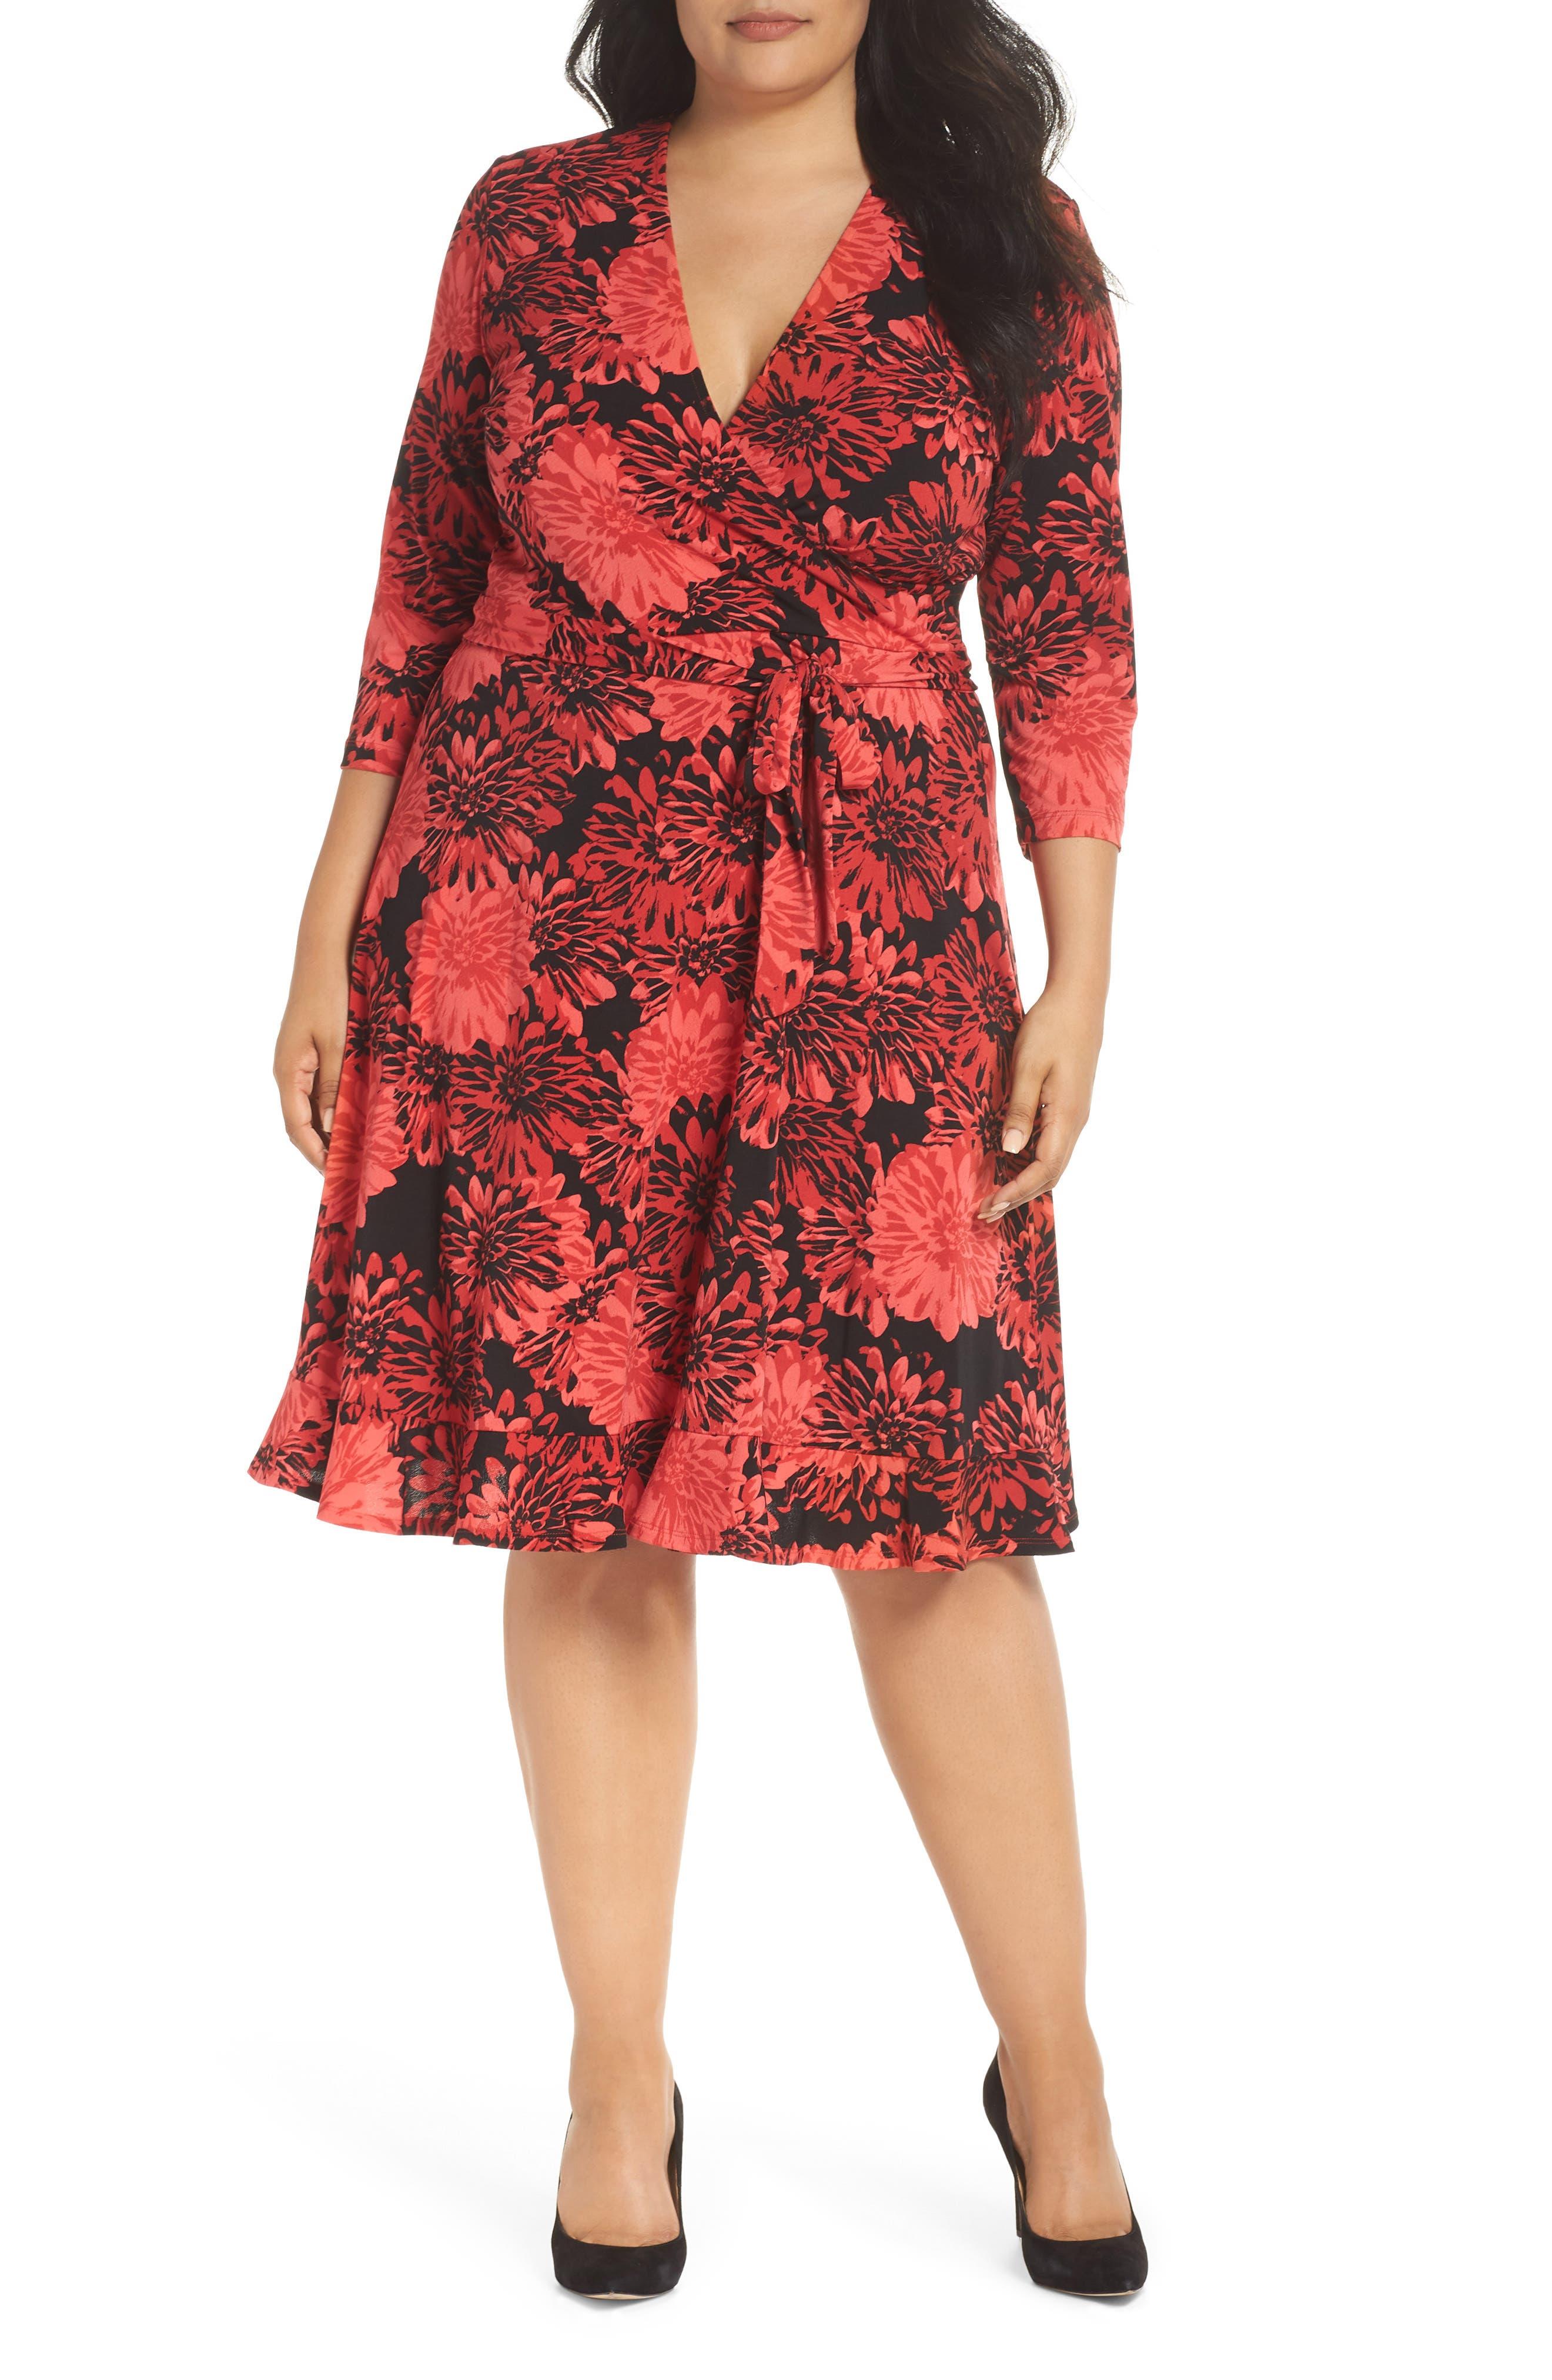 LEOTA Perfect Faux Wrap Ruffle Dress in Flourish